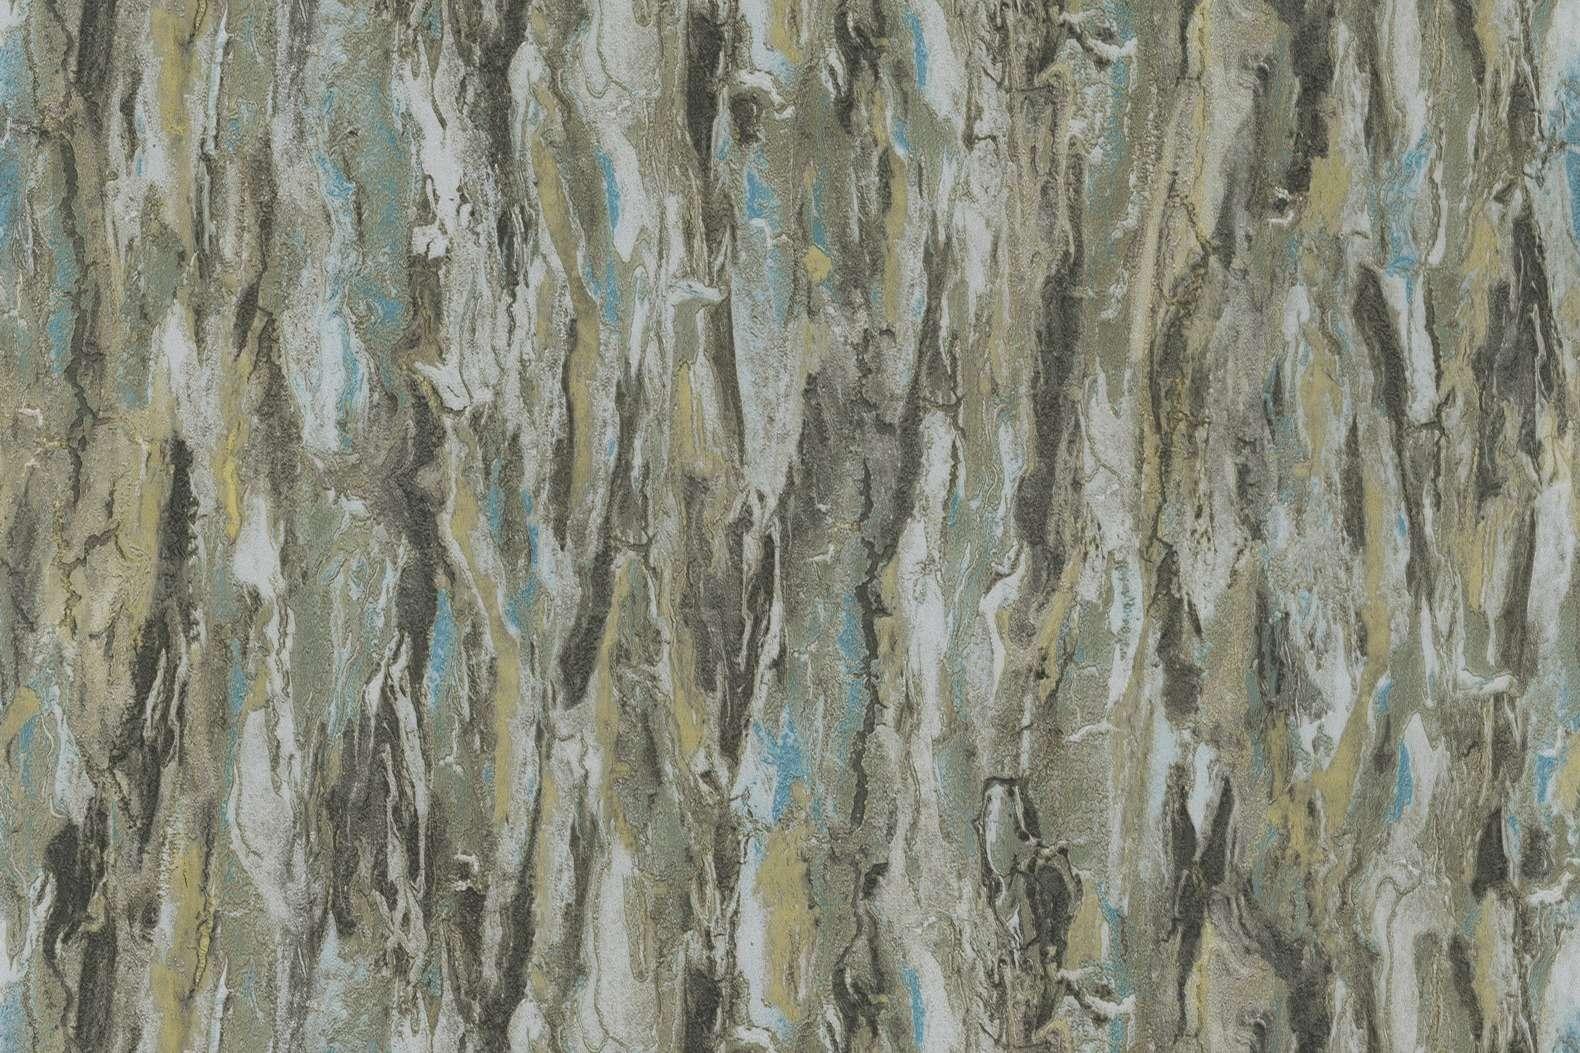 Обои Decori & Decori Carrara 2 — Декори Каррара 2 83685